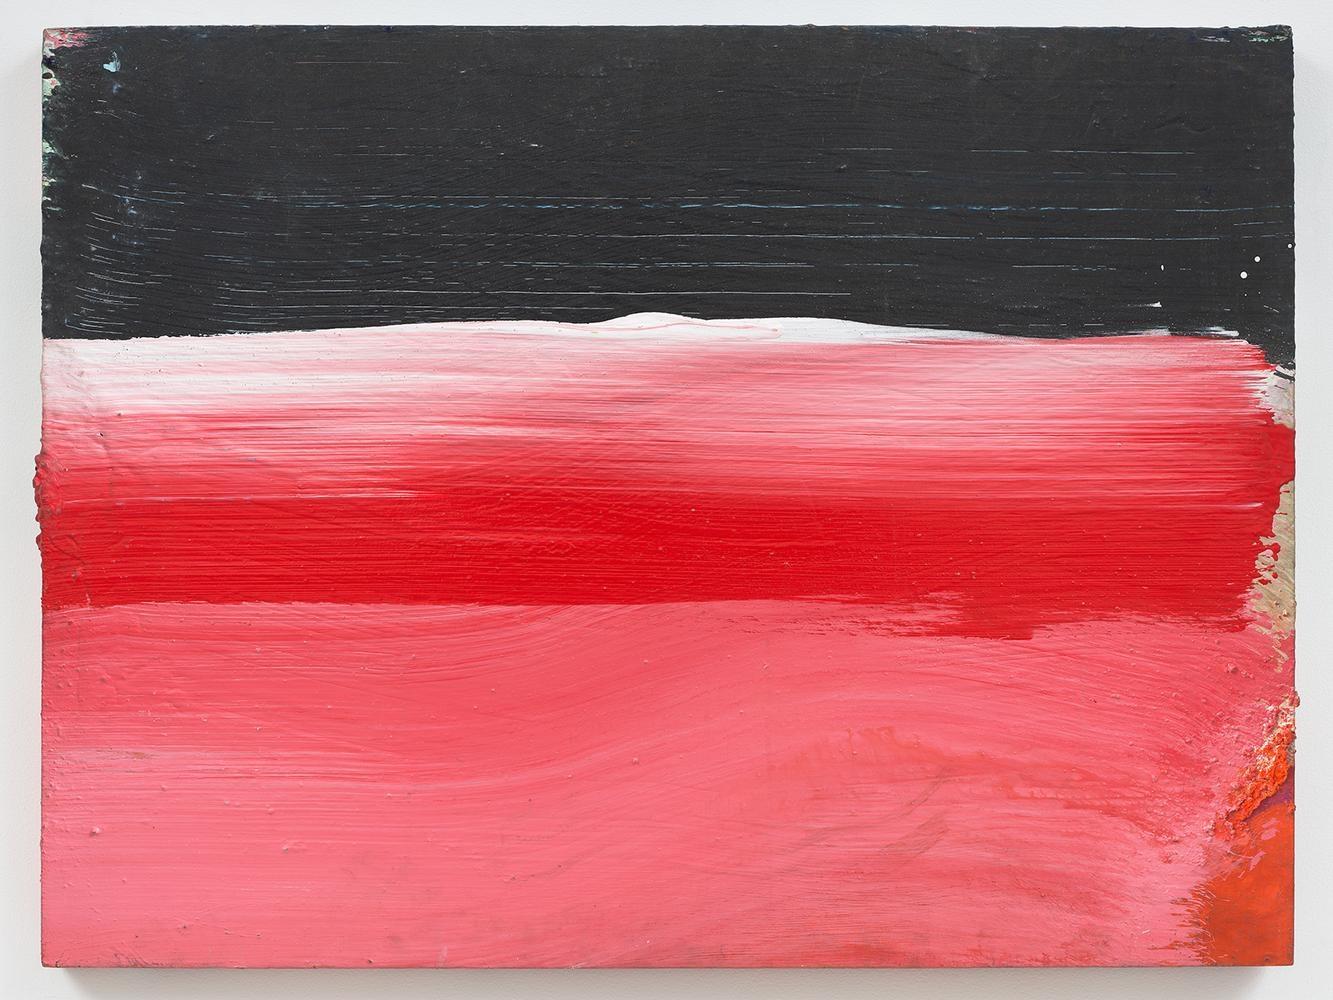 Ed Clark Untitled 2001 acrylic on canvas 36 1/8 x 48 1/4 inches (91.8 x 122.6 cm)